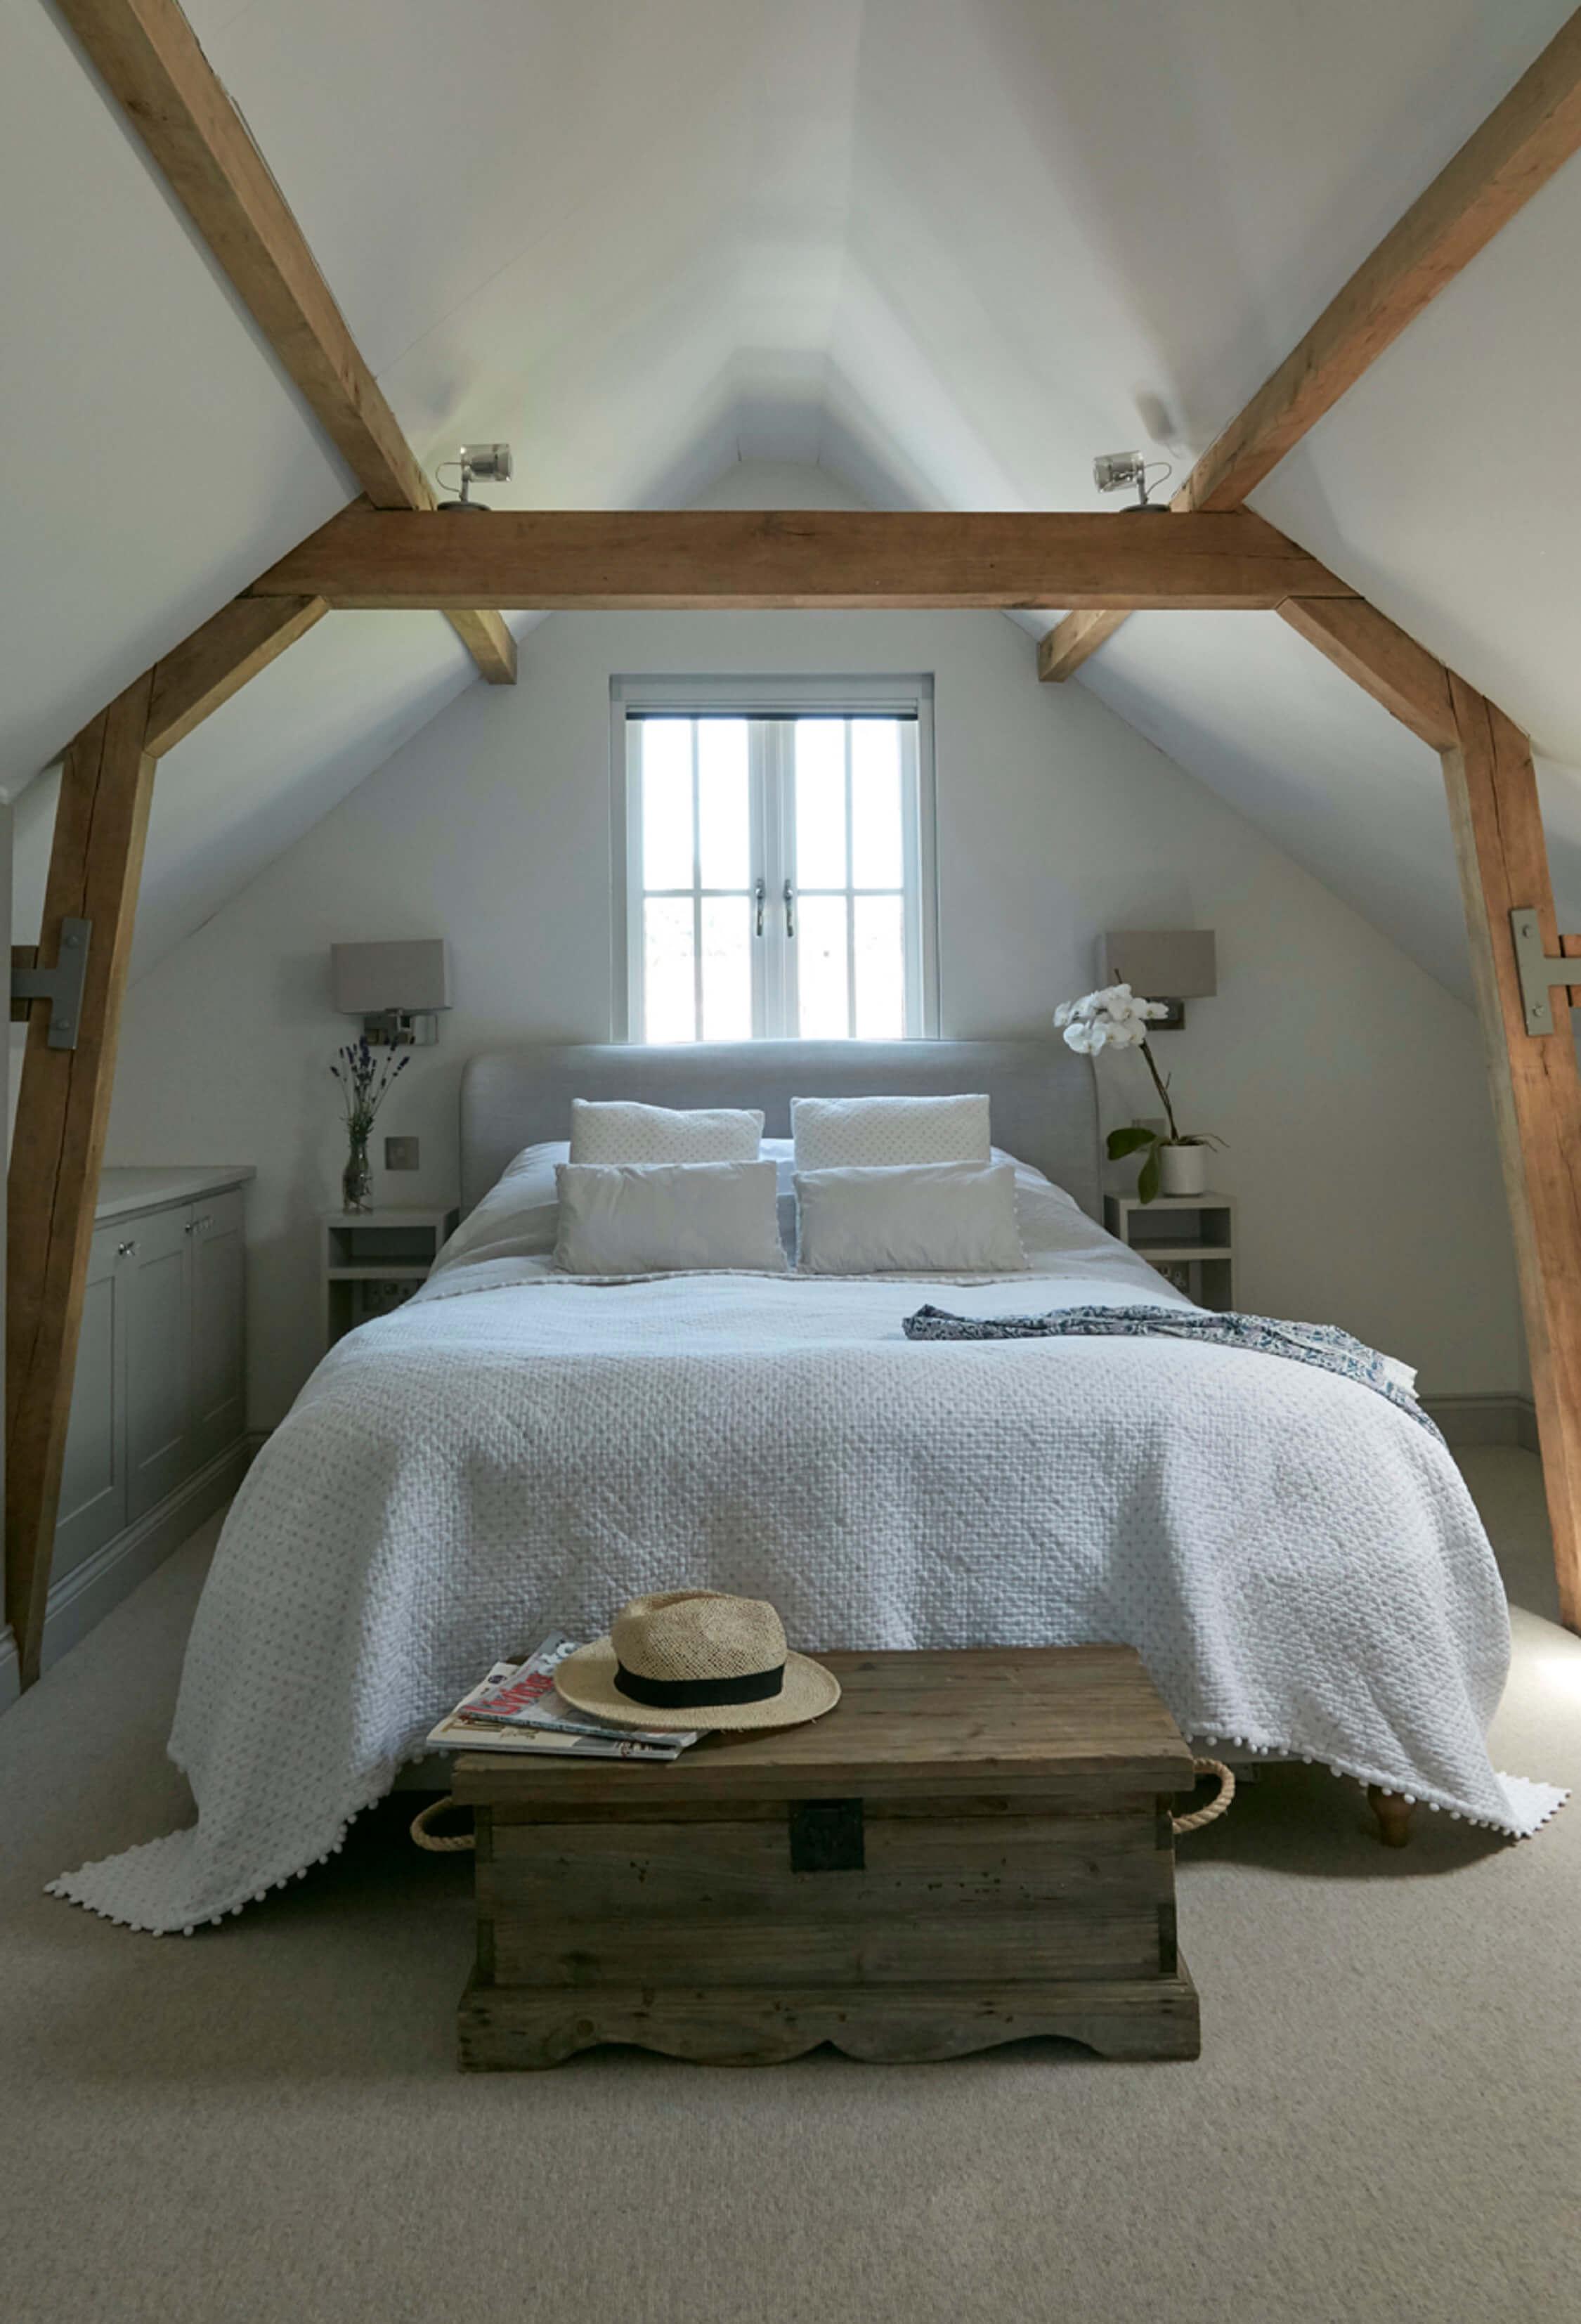 The Barn at Buck's Green - Bedroom